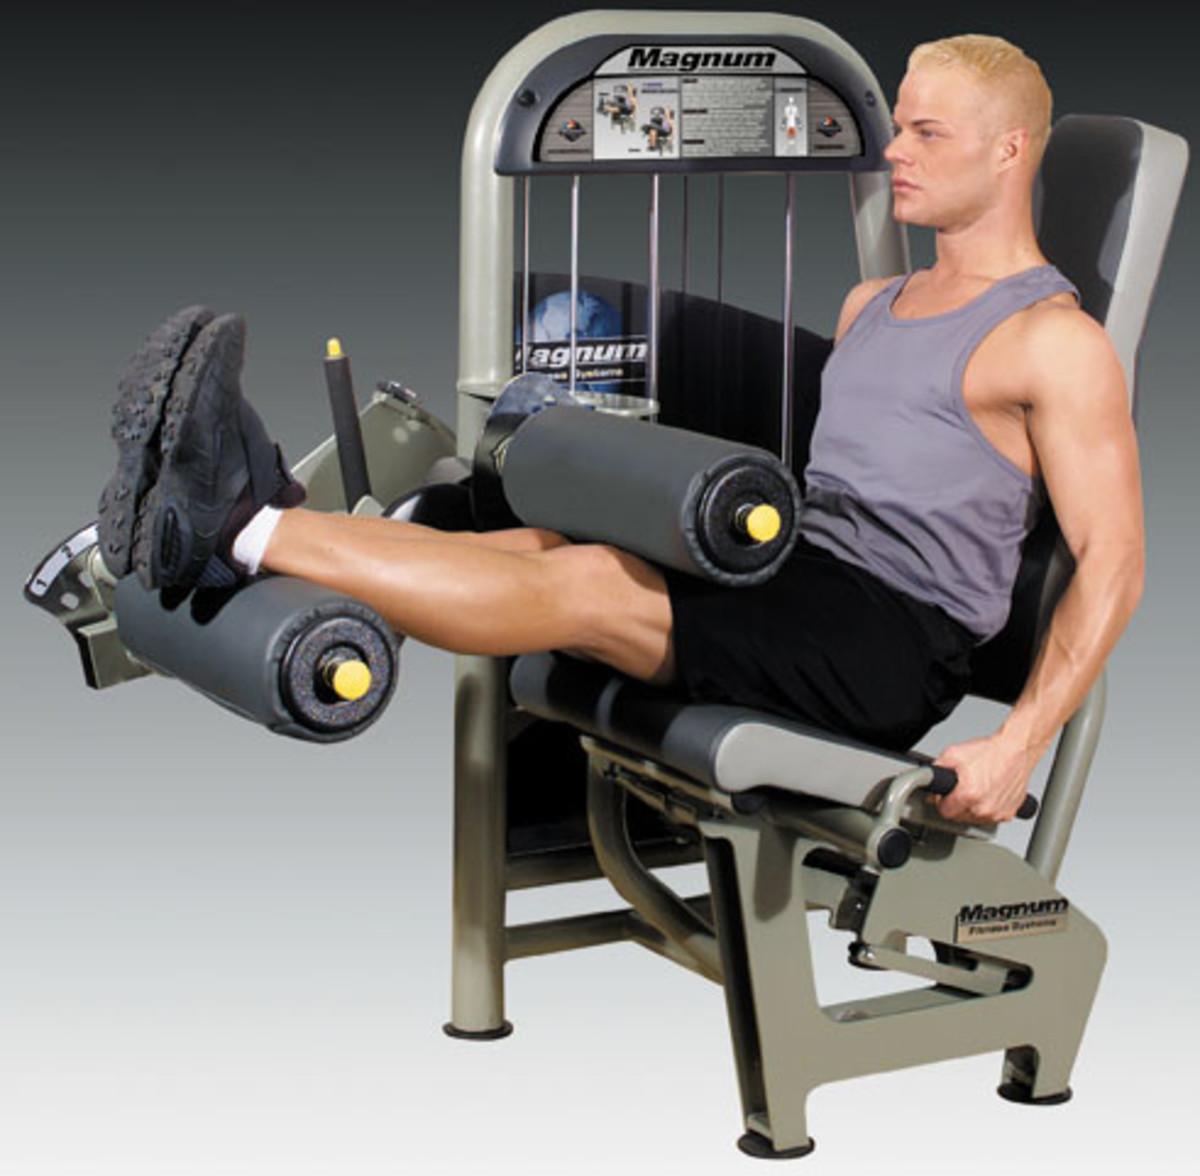 Leg Fitness Exercises on Equipment: Roman Chair, Leg Curls and Squats